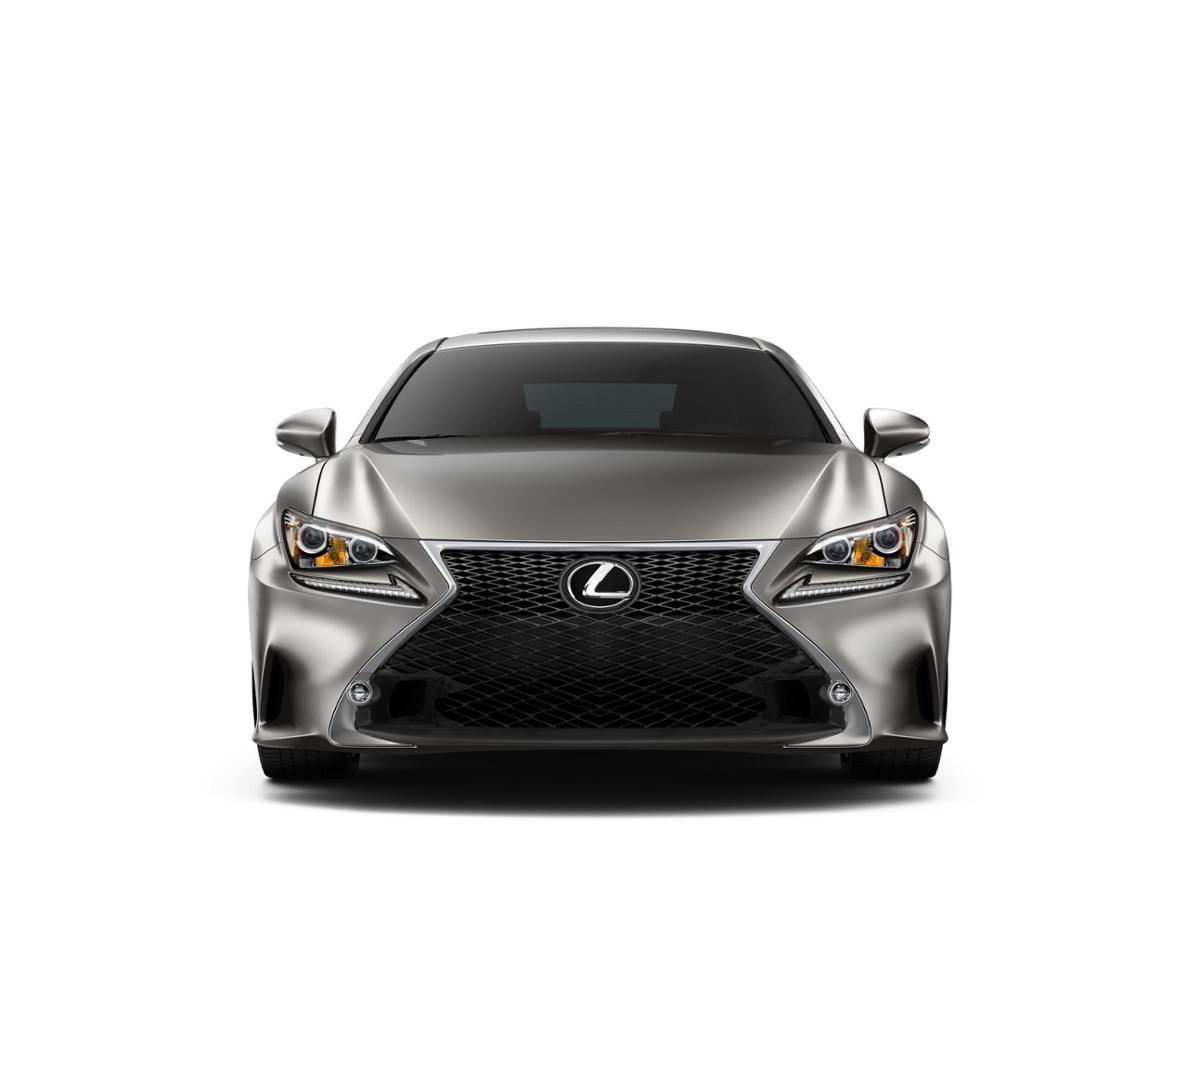 2017 Lexus Rc 350 From Larry H Miller Lexus Murray Ask